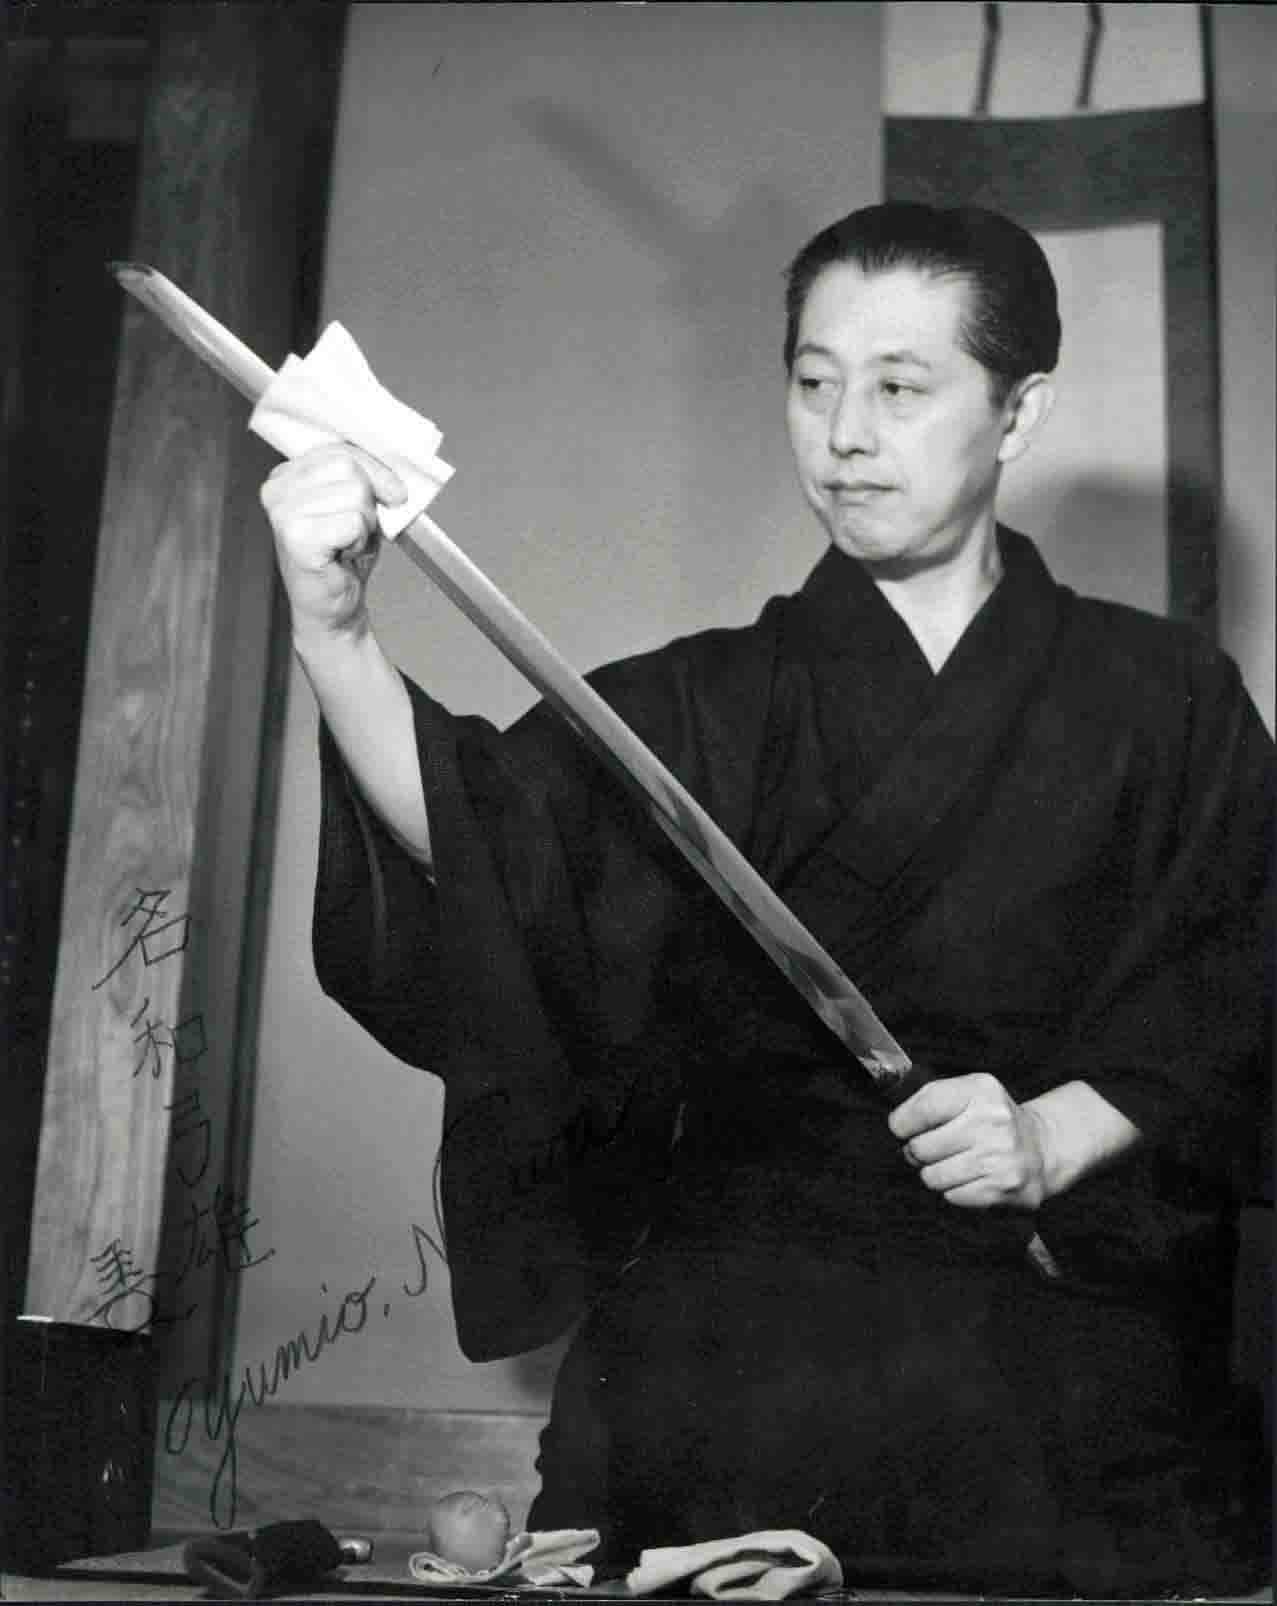 Headmaster Yumio Nawa of the Masaki Ryu